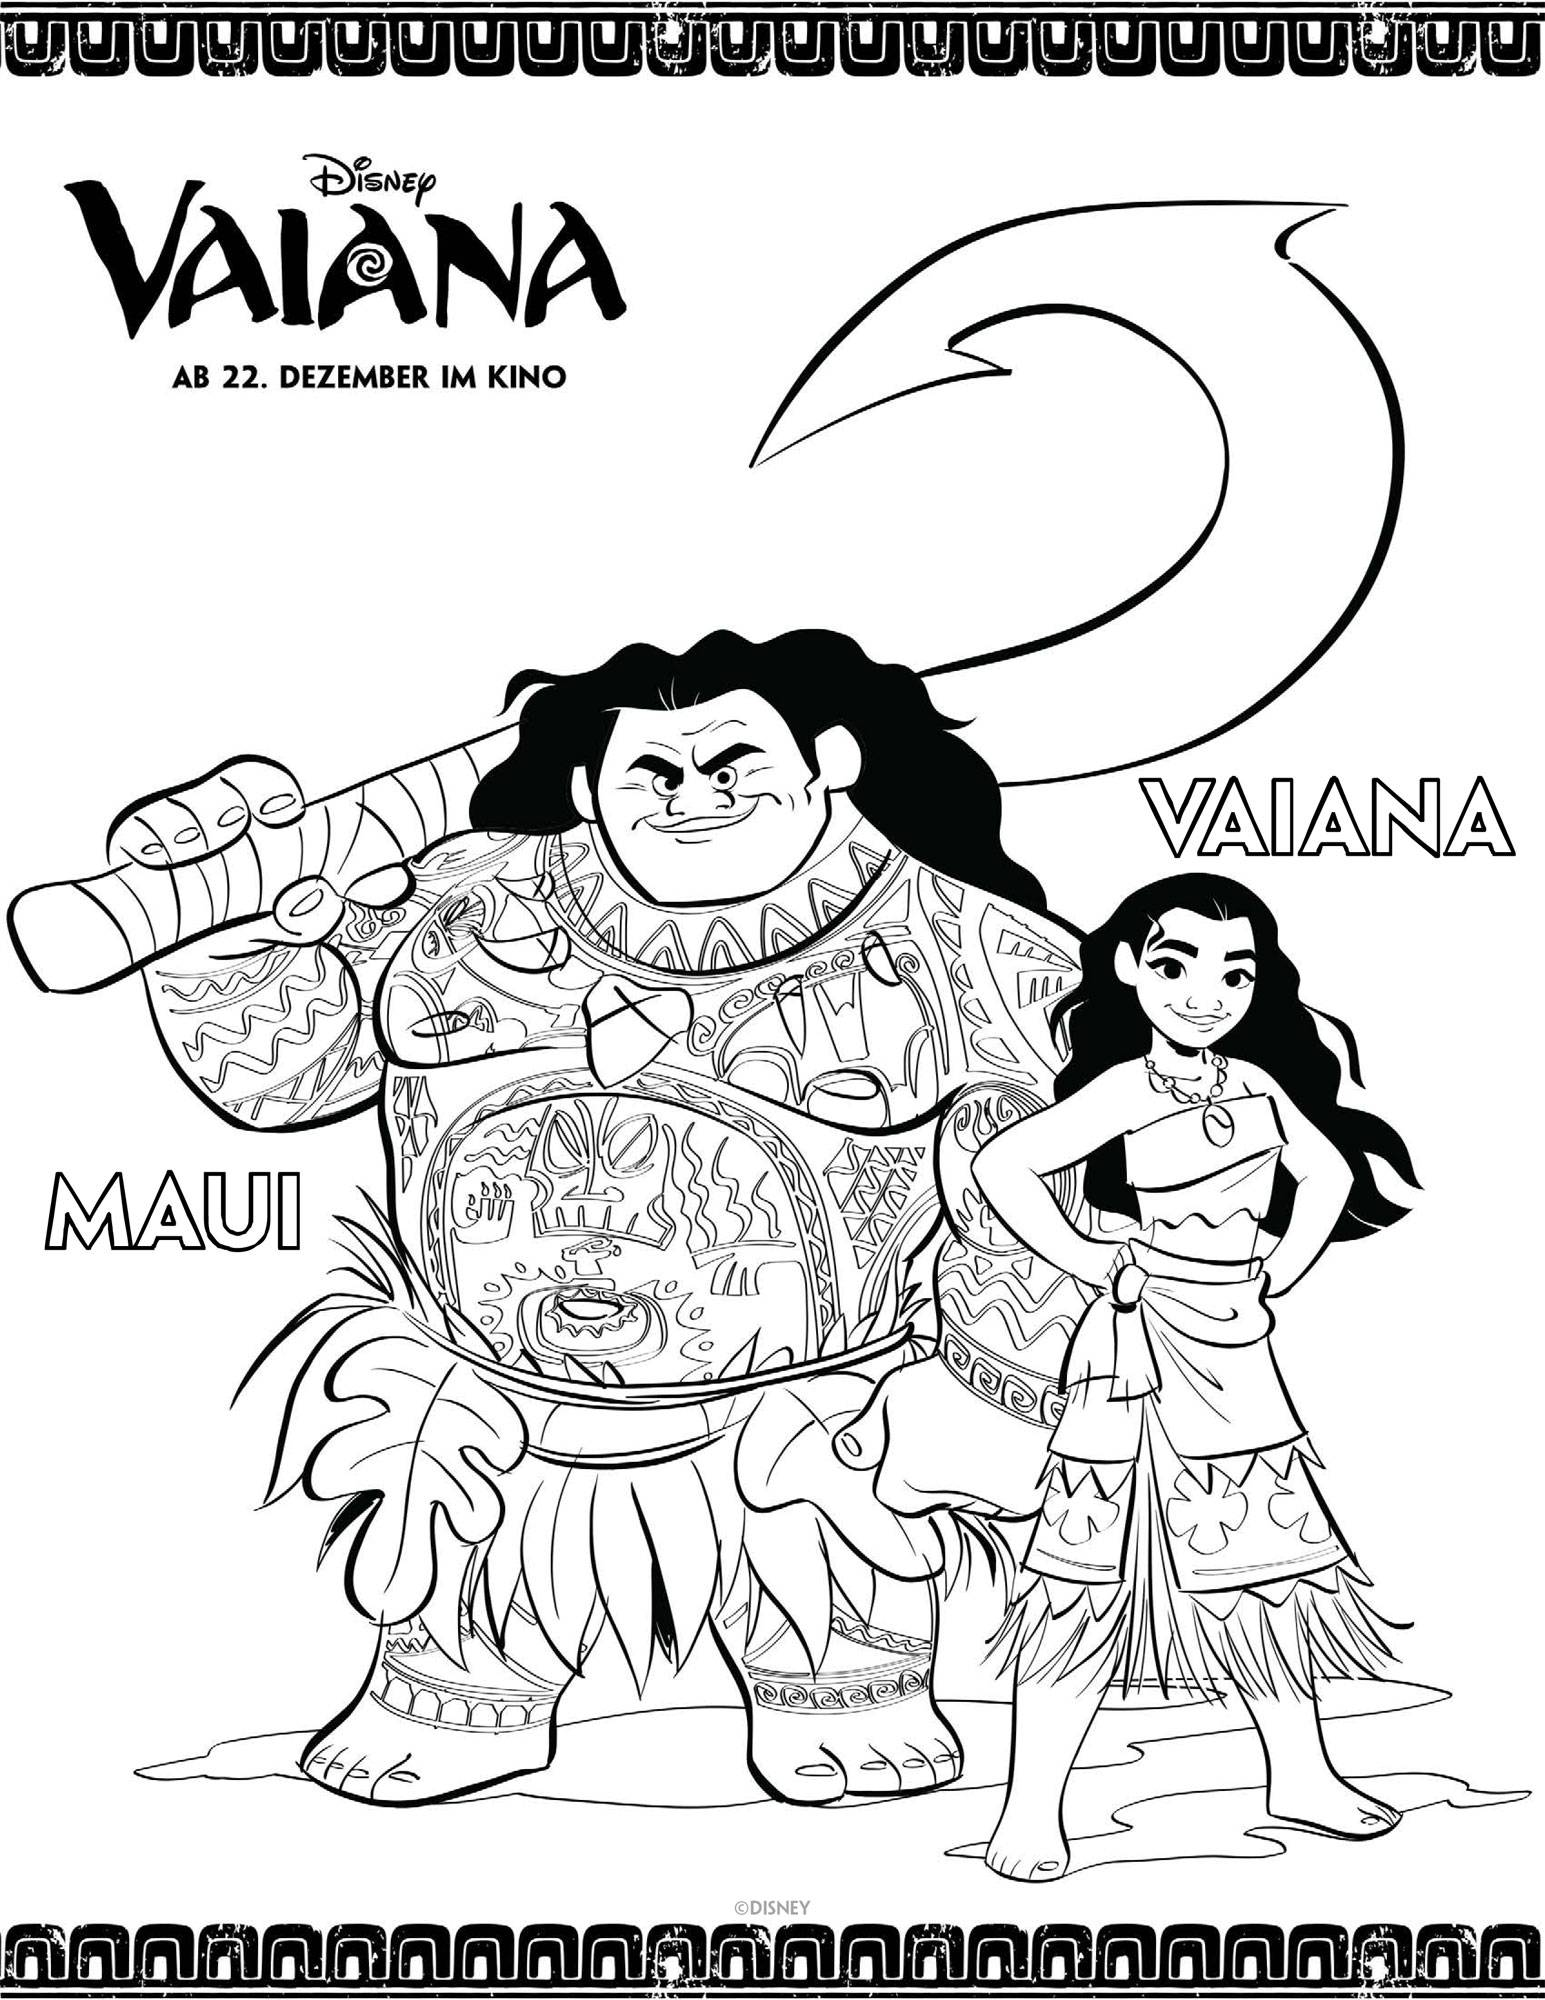 Ausmalbild Vaiana Vaiana und Maui ausmalen kostenlos